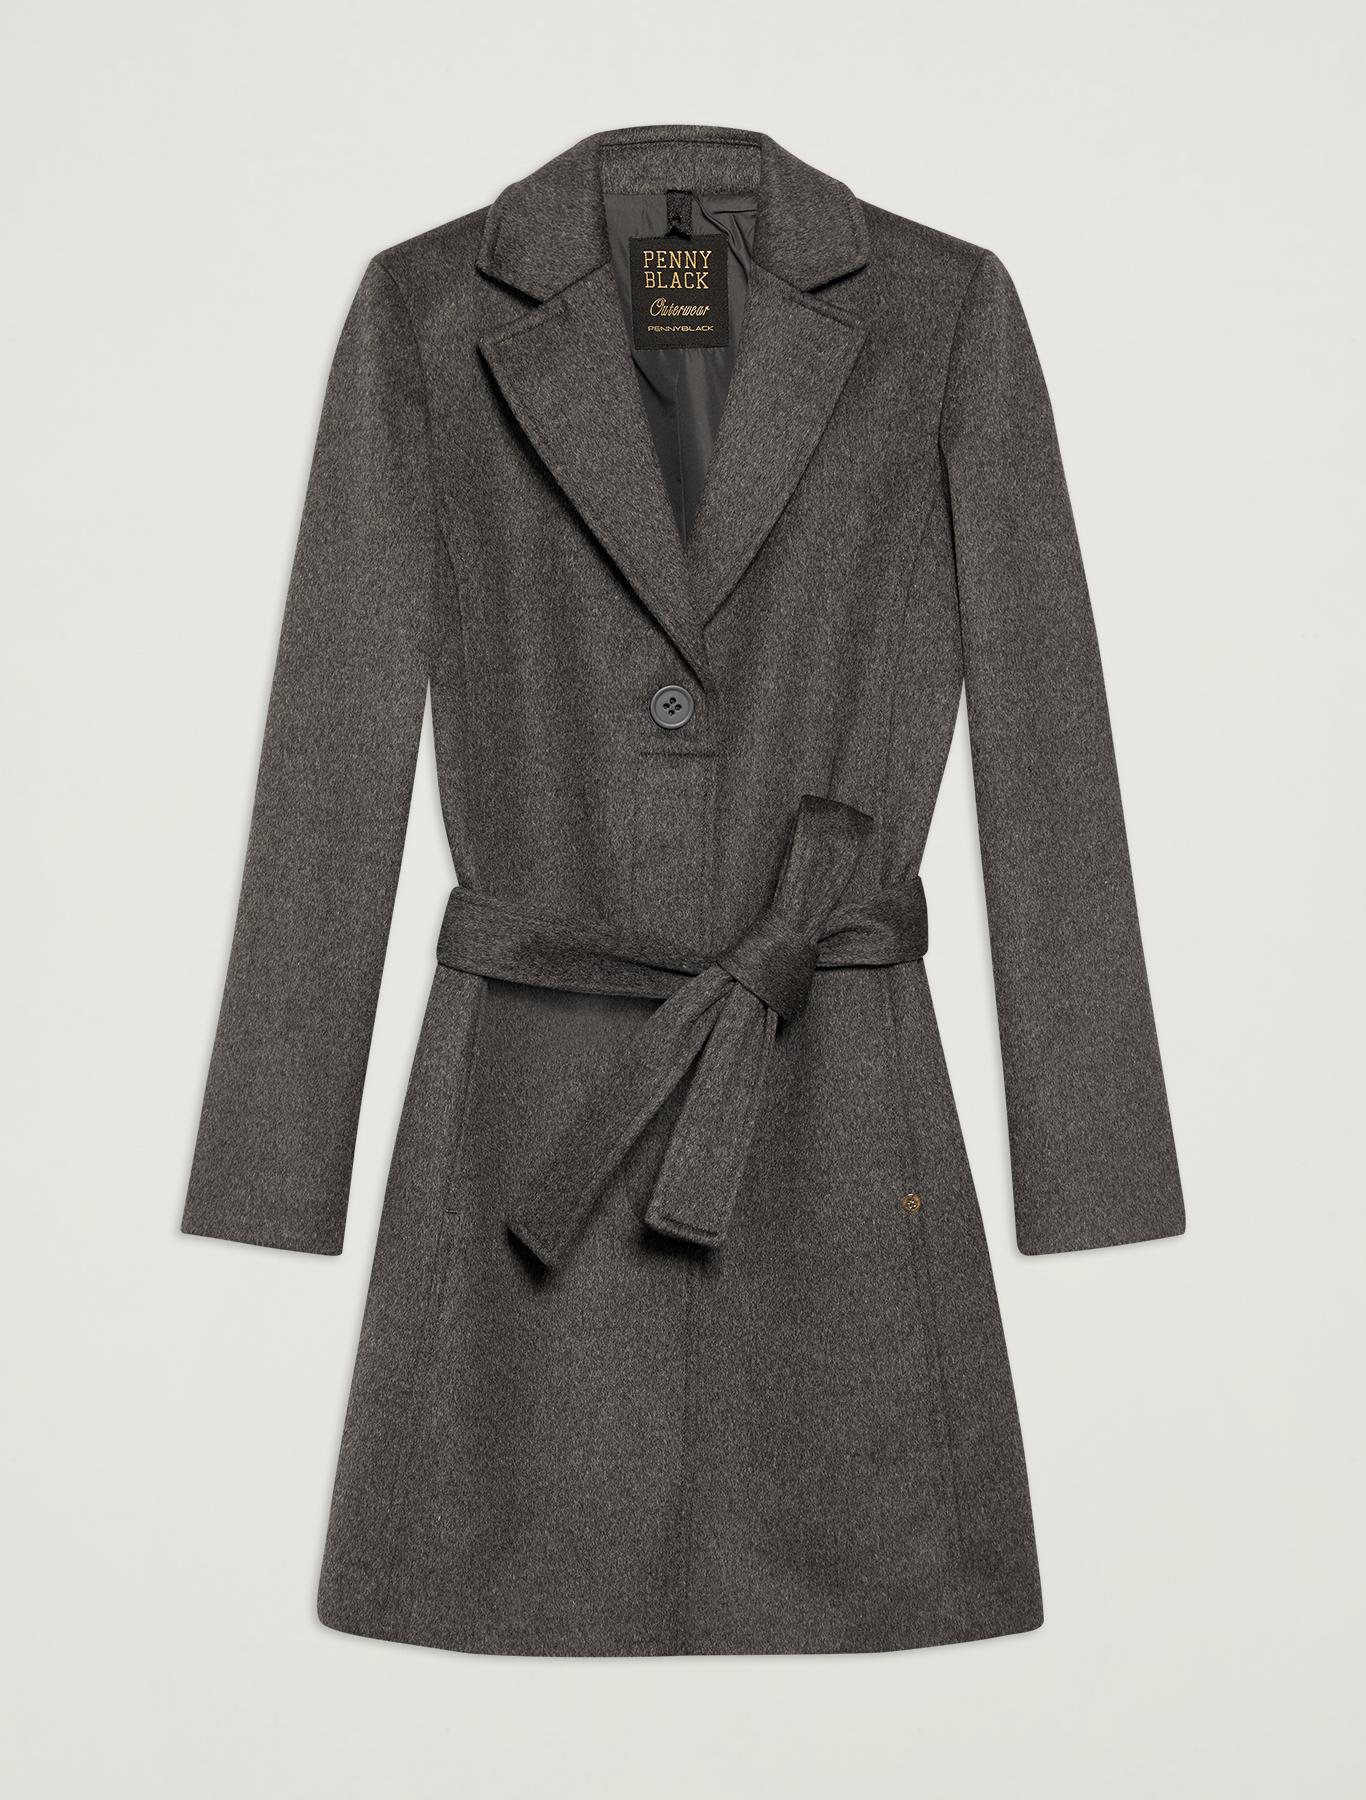 Pure wool coat - dark grey - pennyblack